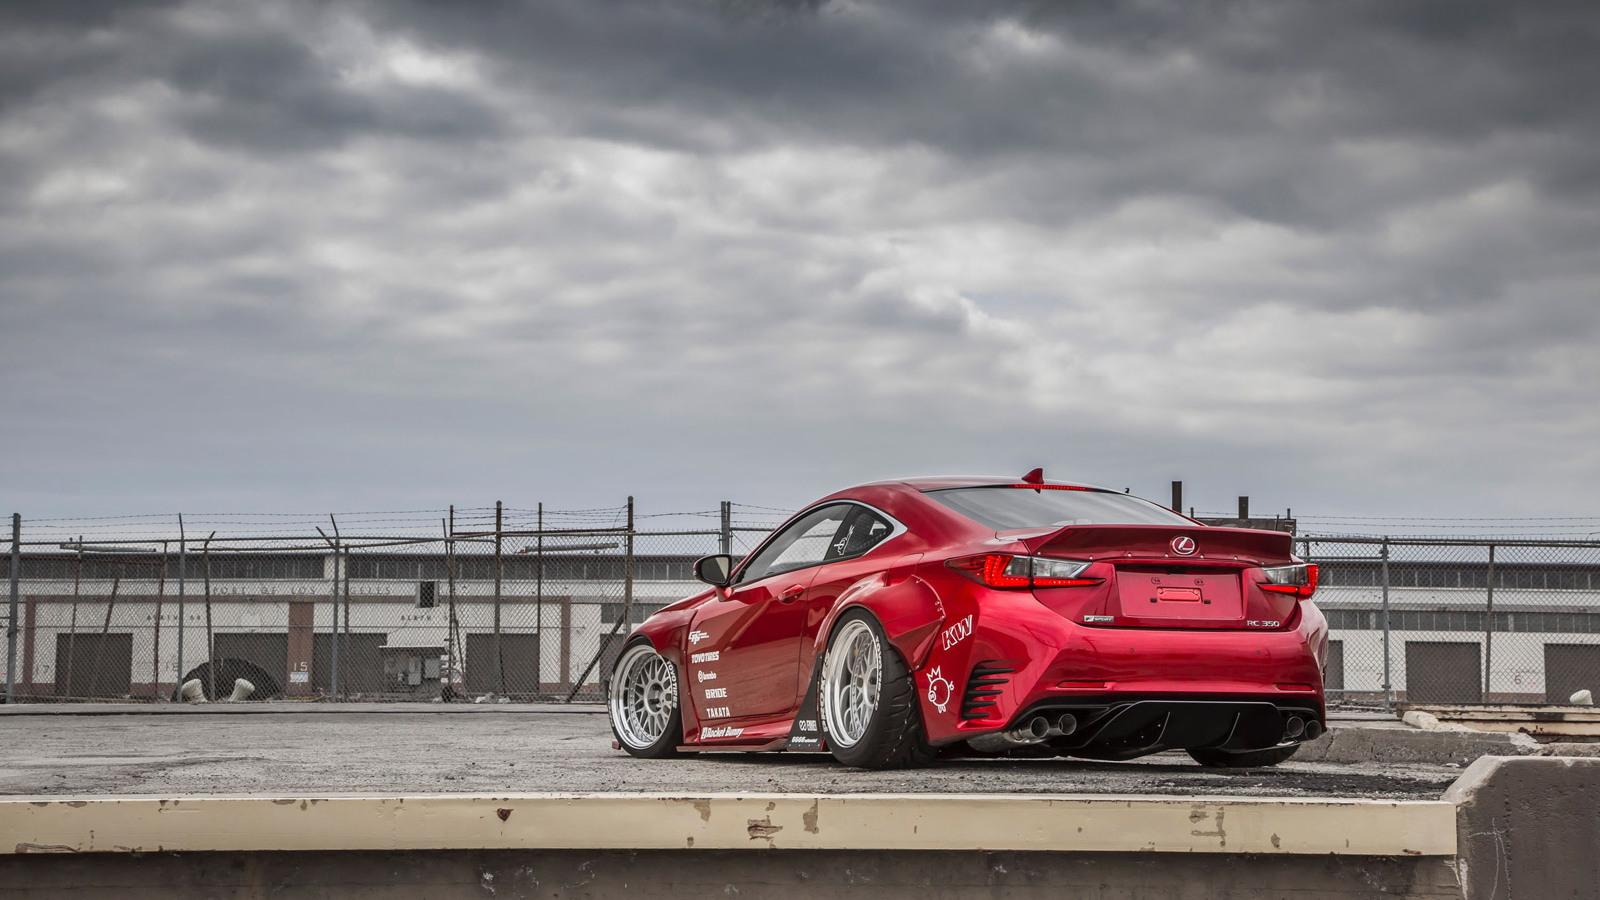 2015 Lexus RC 350 by Gordon Ting and Beyond Marketing, 2014 SEMA show